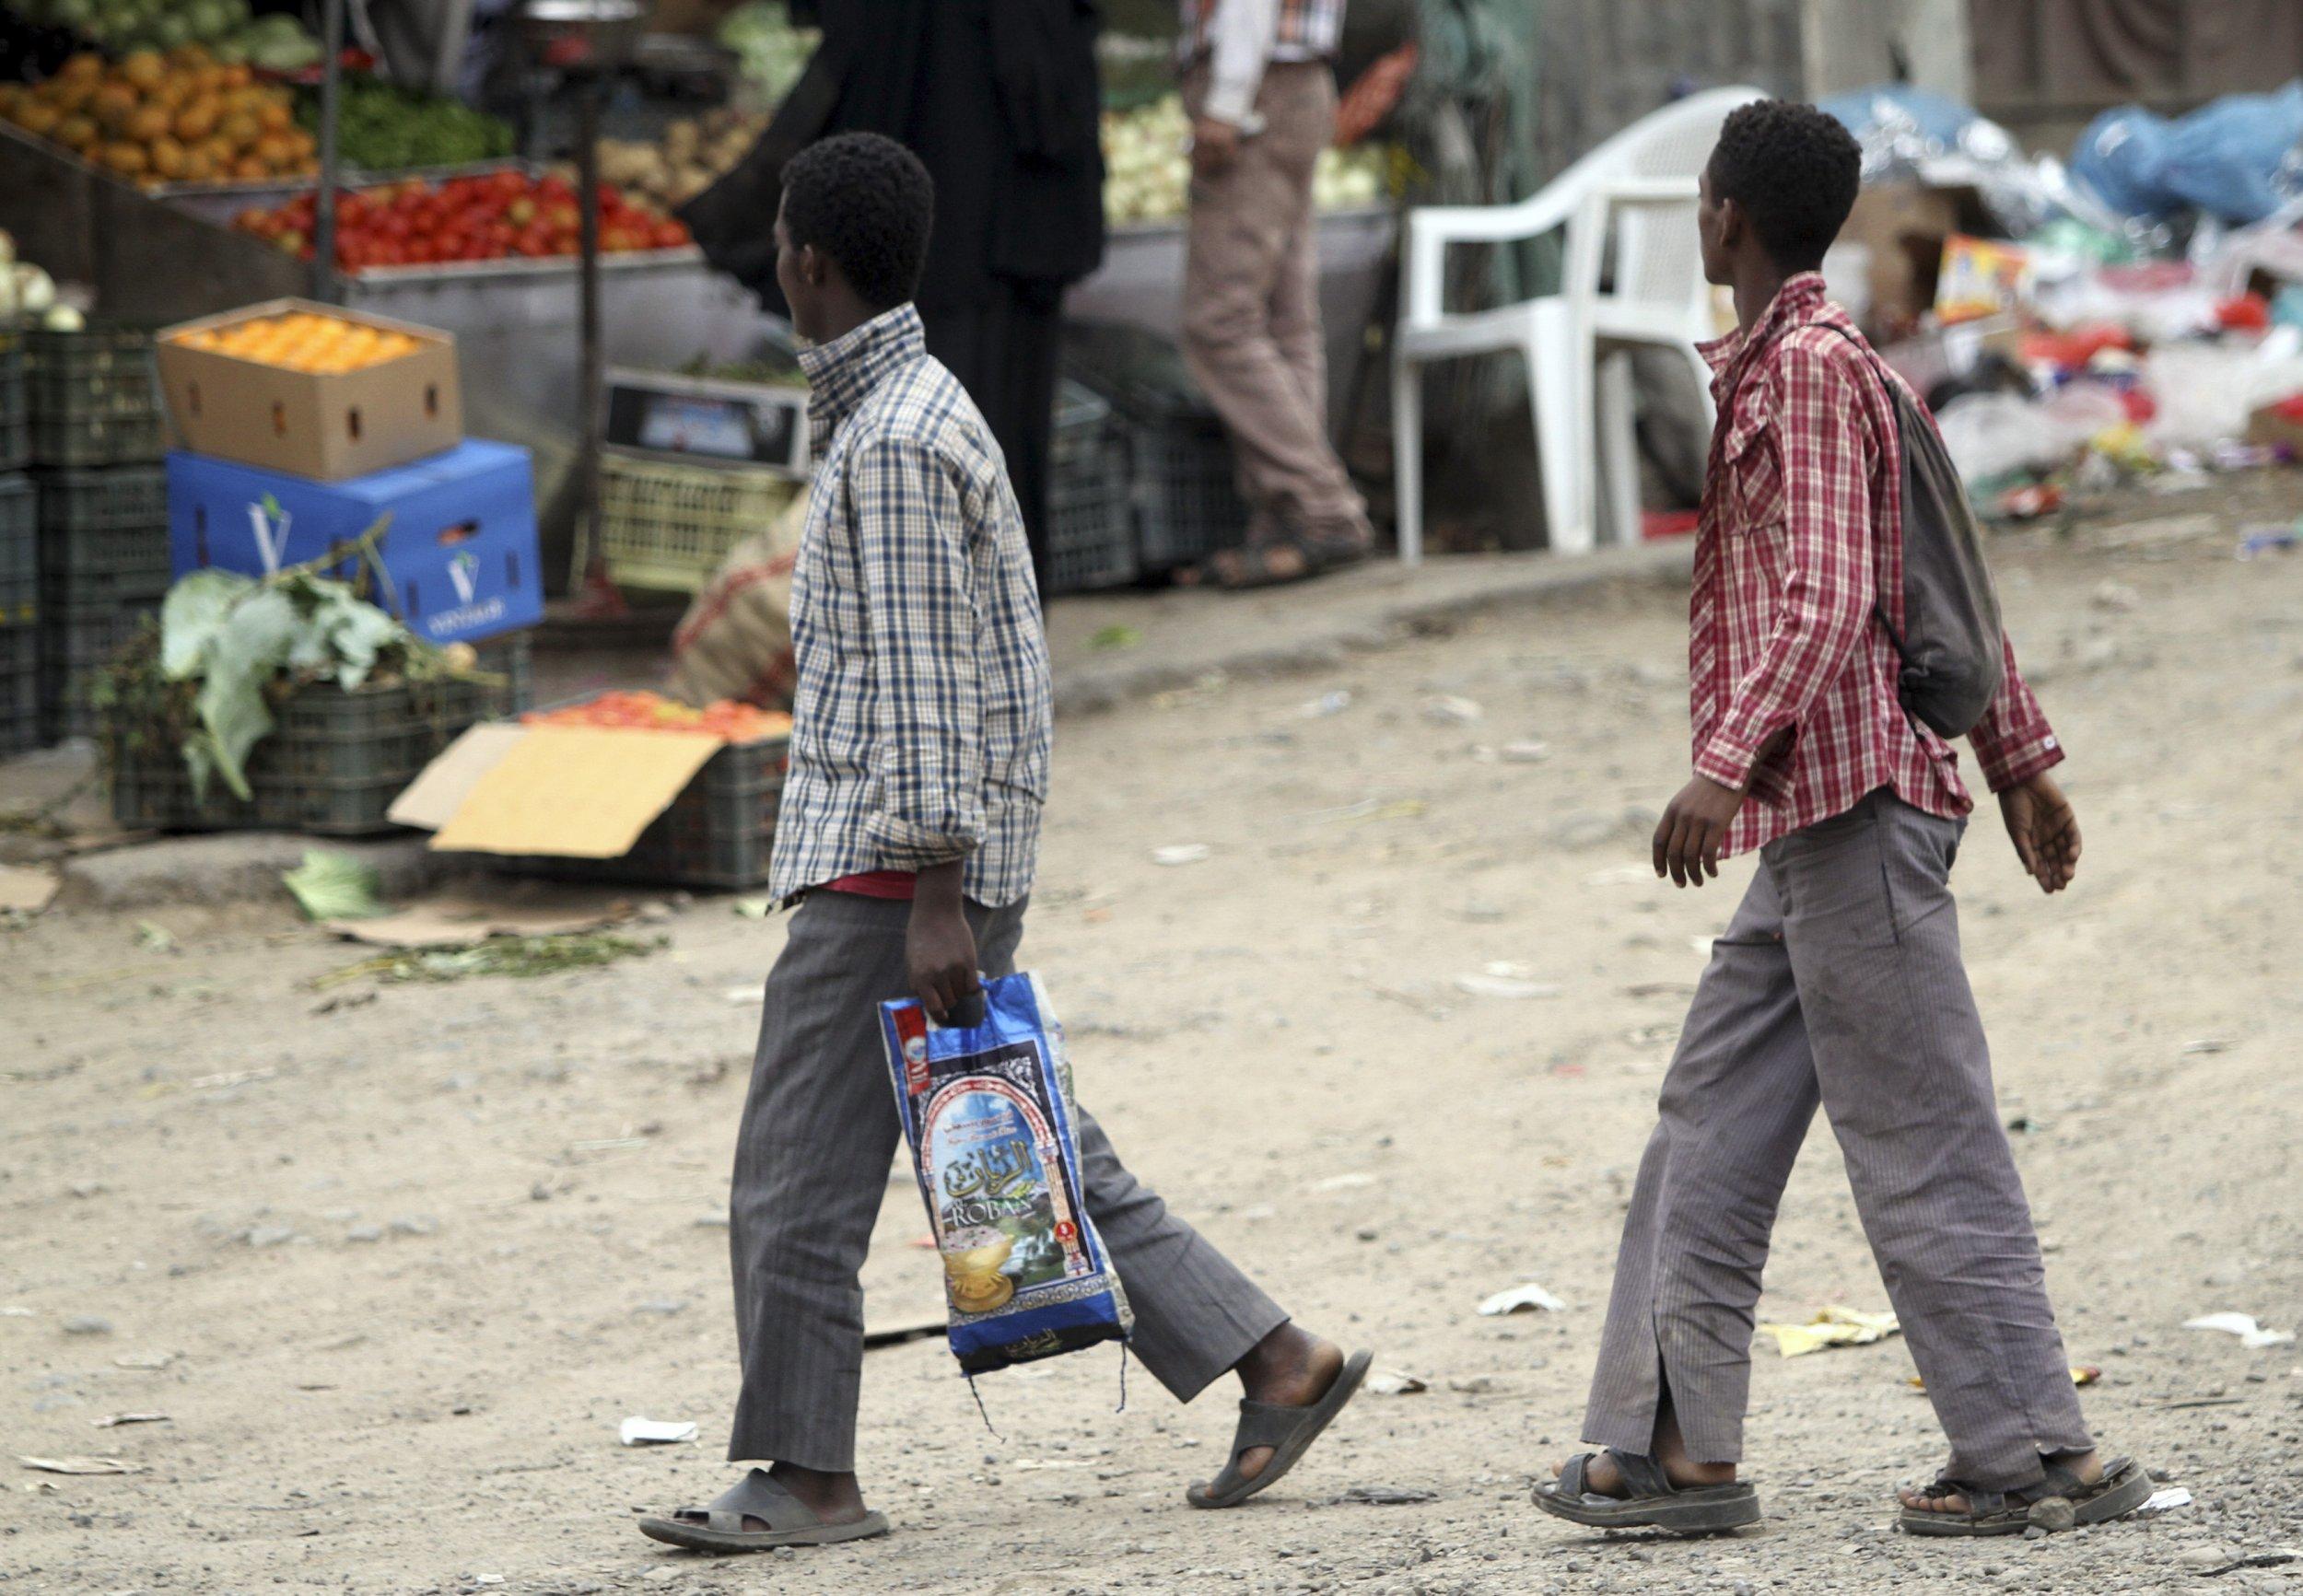 Somali Ethiopian refugees in Yemen